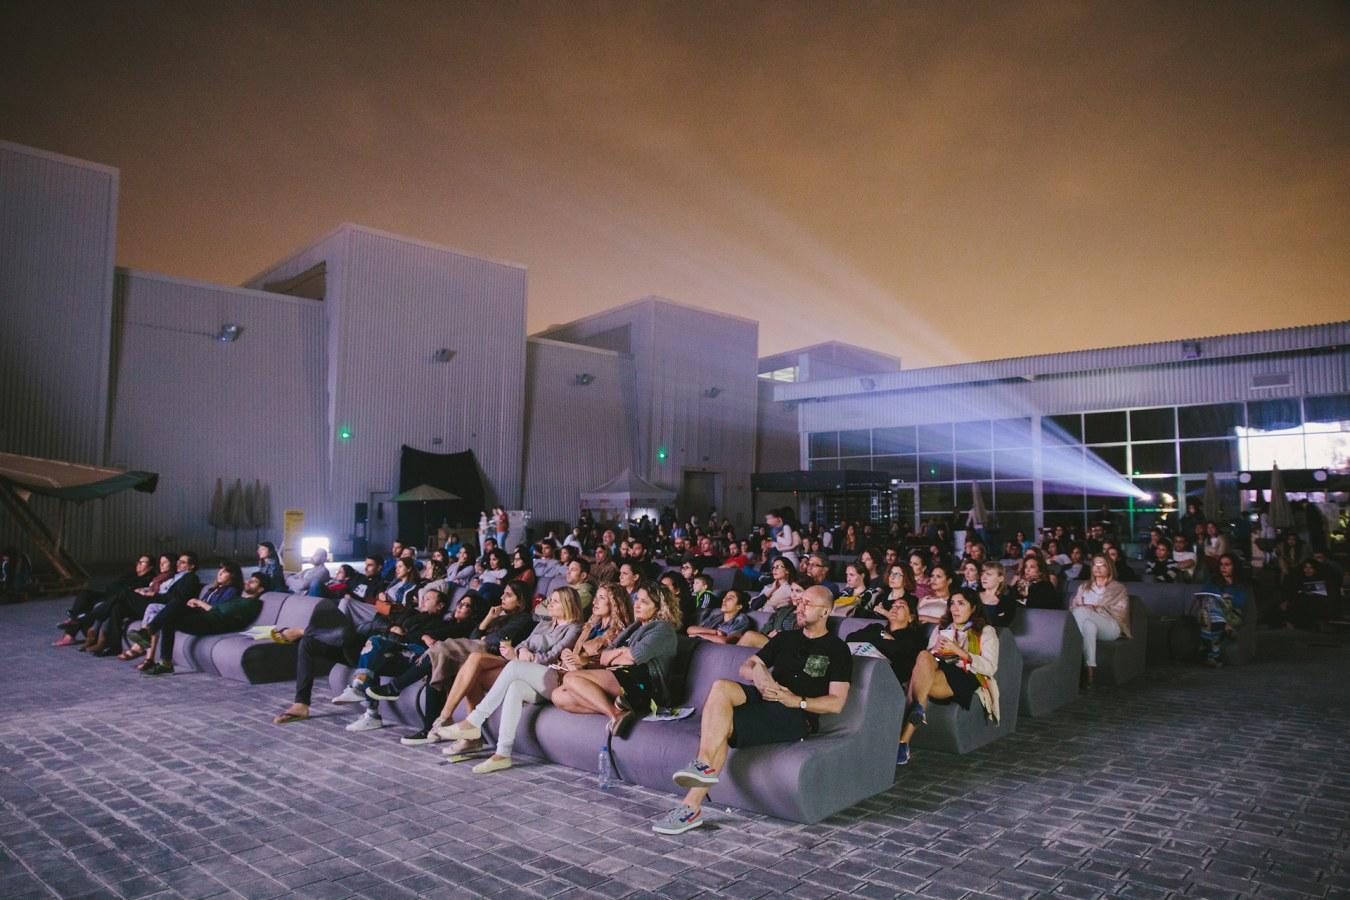 Bayut.com Recommends Cinema Akil at the Yard Arsekal Avenue Dubai